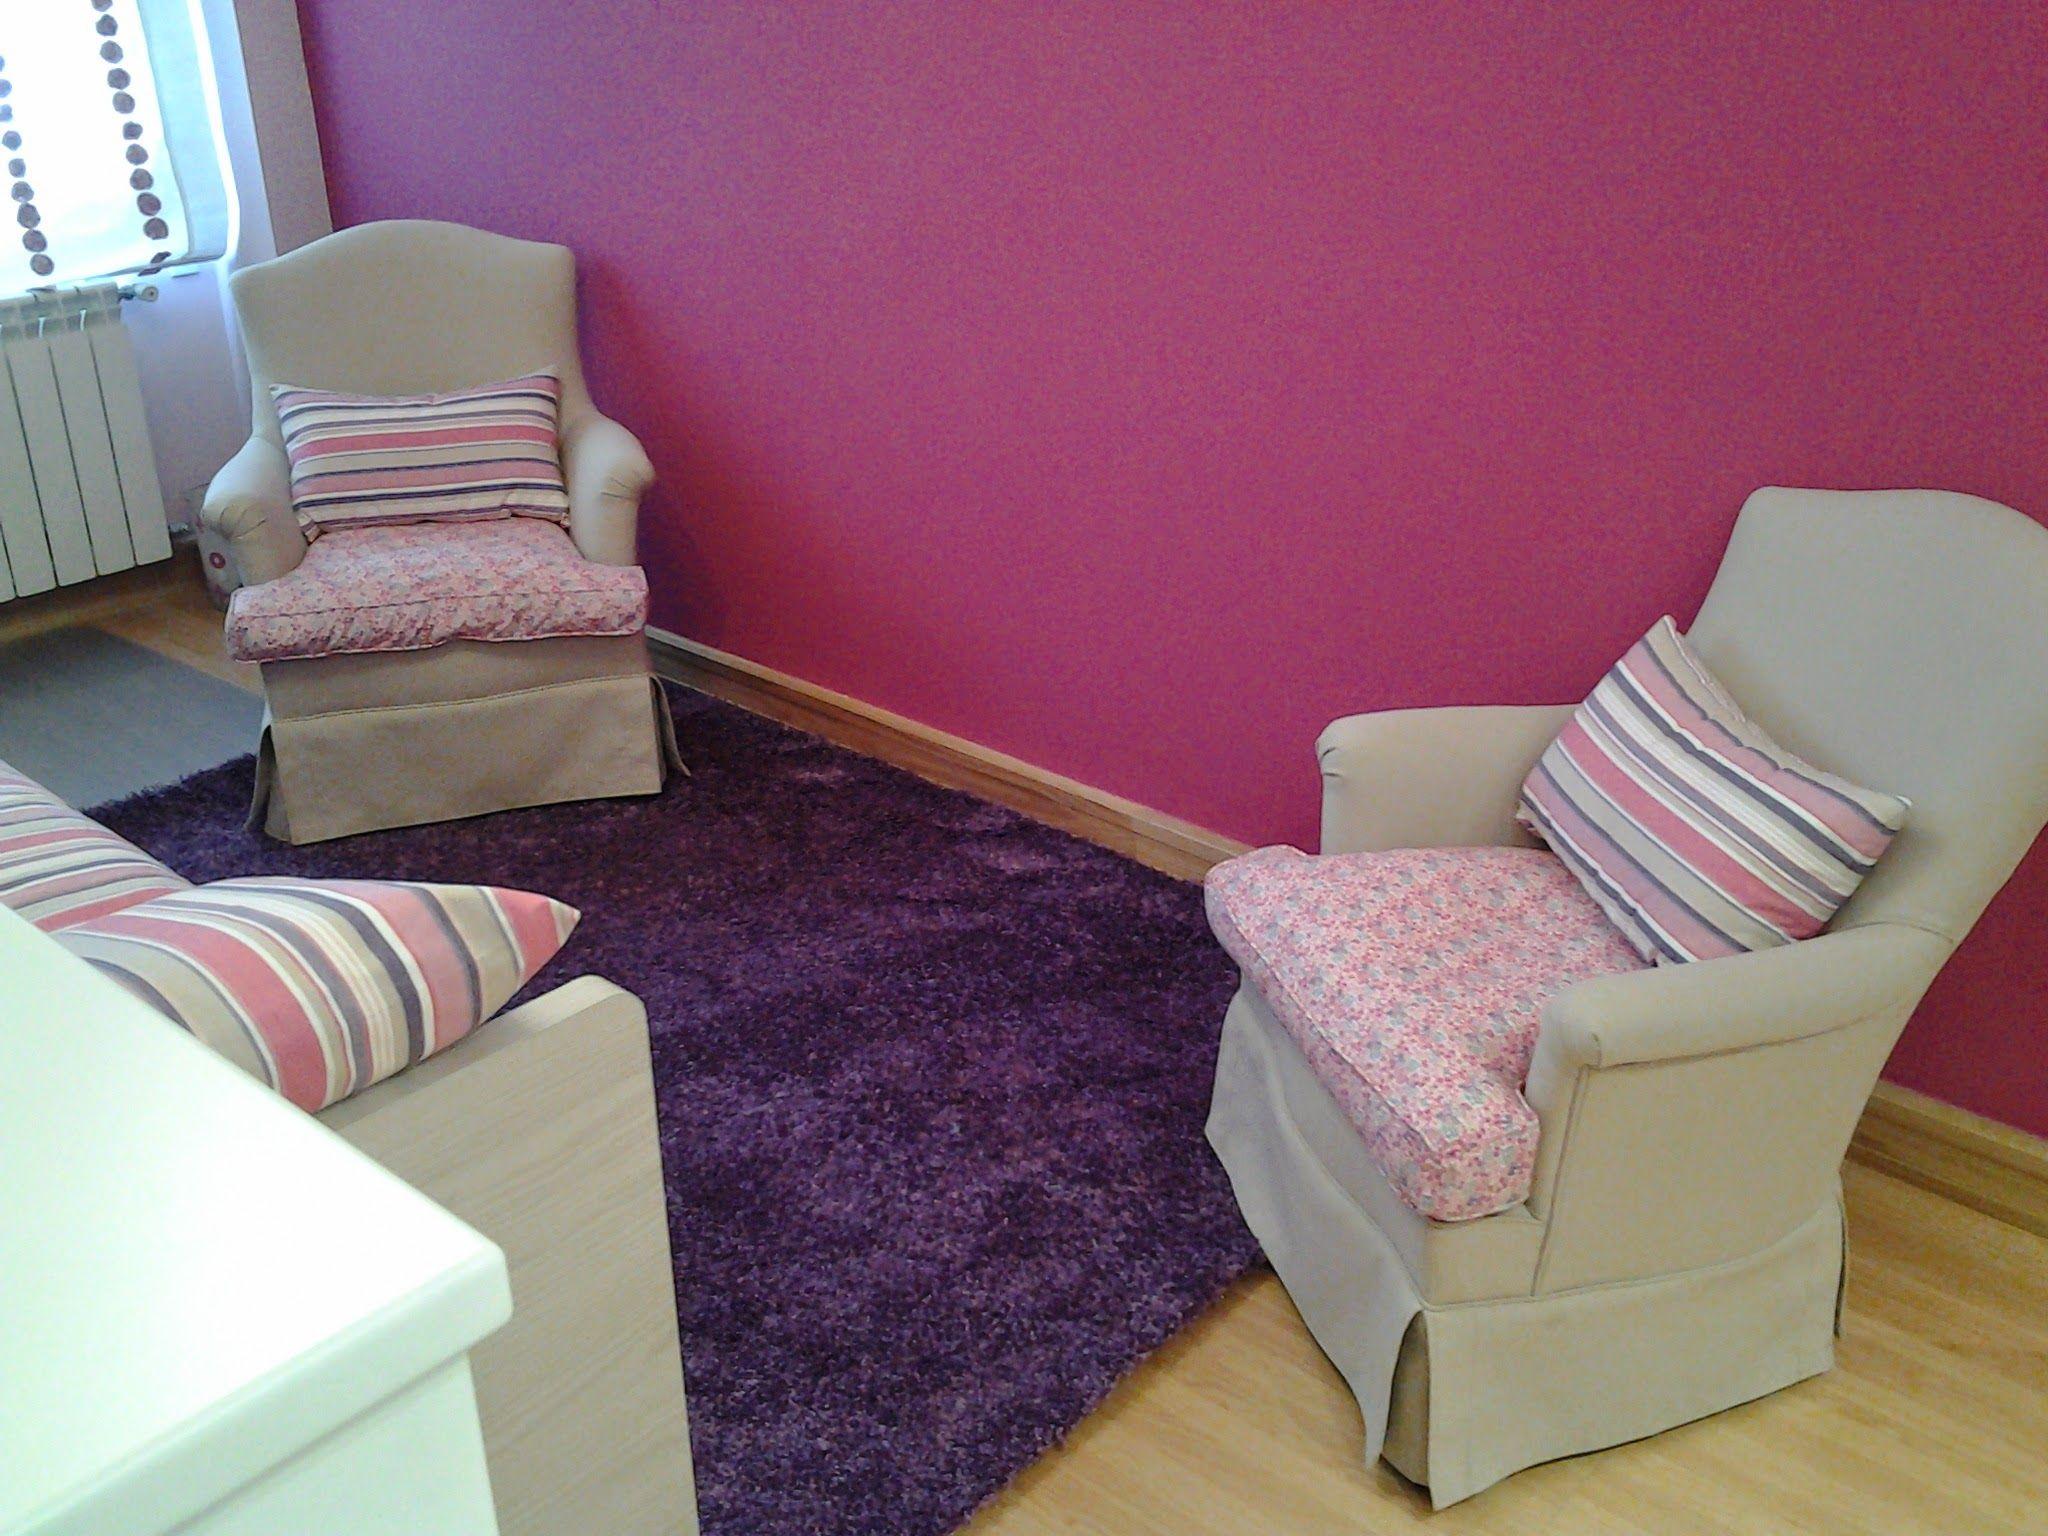 Butacas restauradas tapizadas para dormitorio juvenil muebles especiales pinterest - Butacas para dormitorios ...